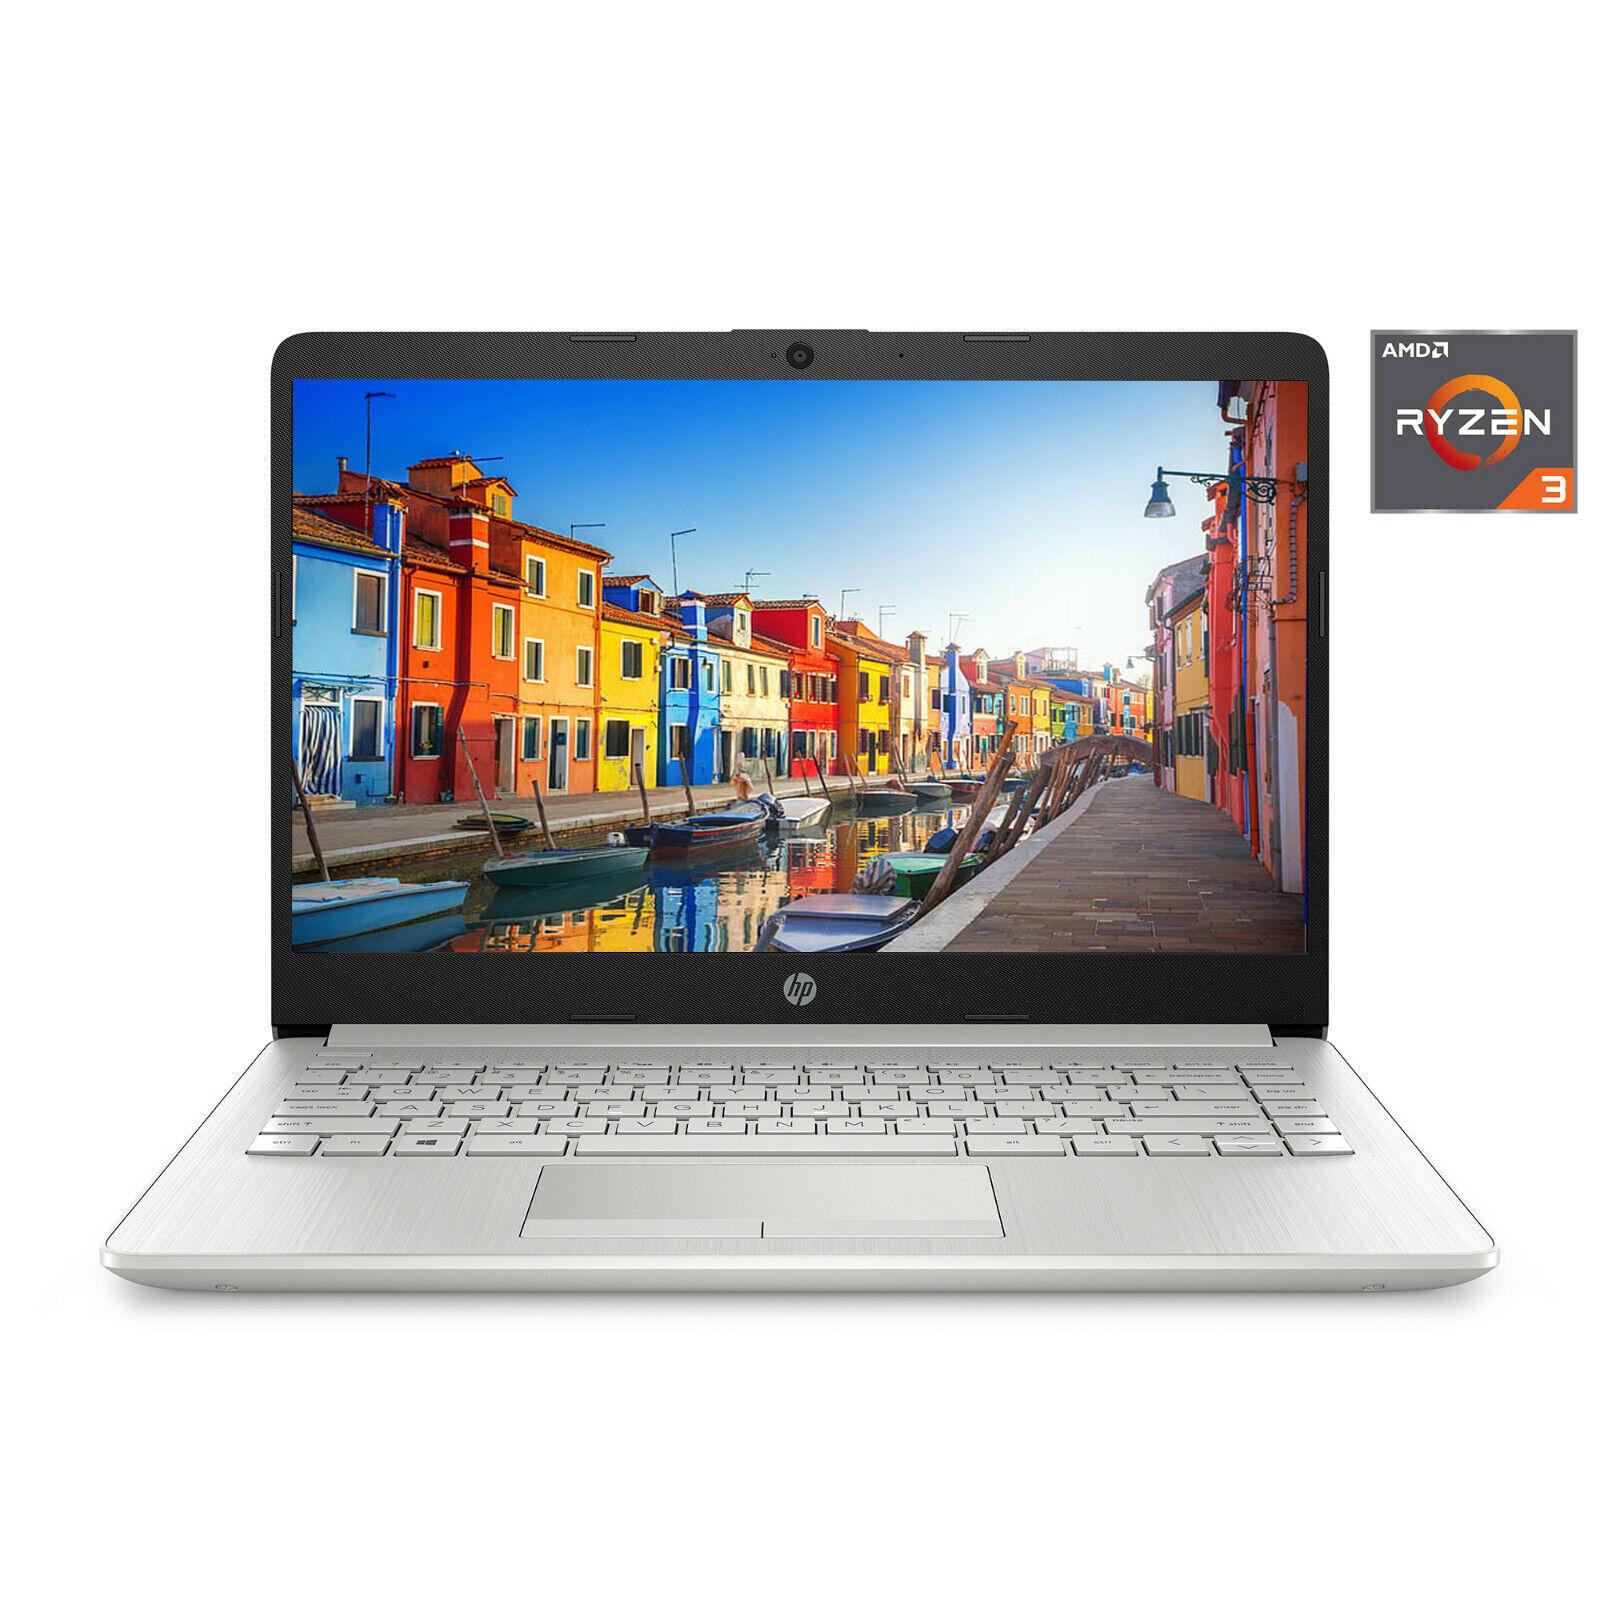 "Laptop Windows - NEW HP 14"" HD AMD Ryzen 3 3.5GHz 4GB ✨ 1TB ✨ HDD Radeon Vega 3 Windows 10 Laptop"